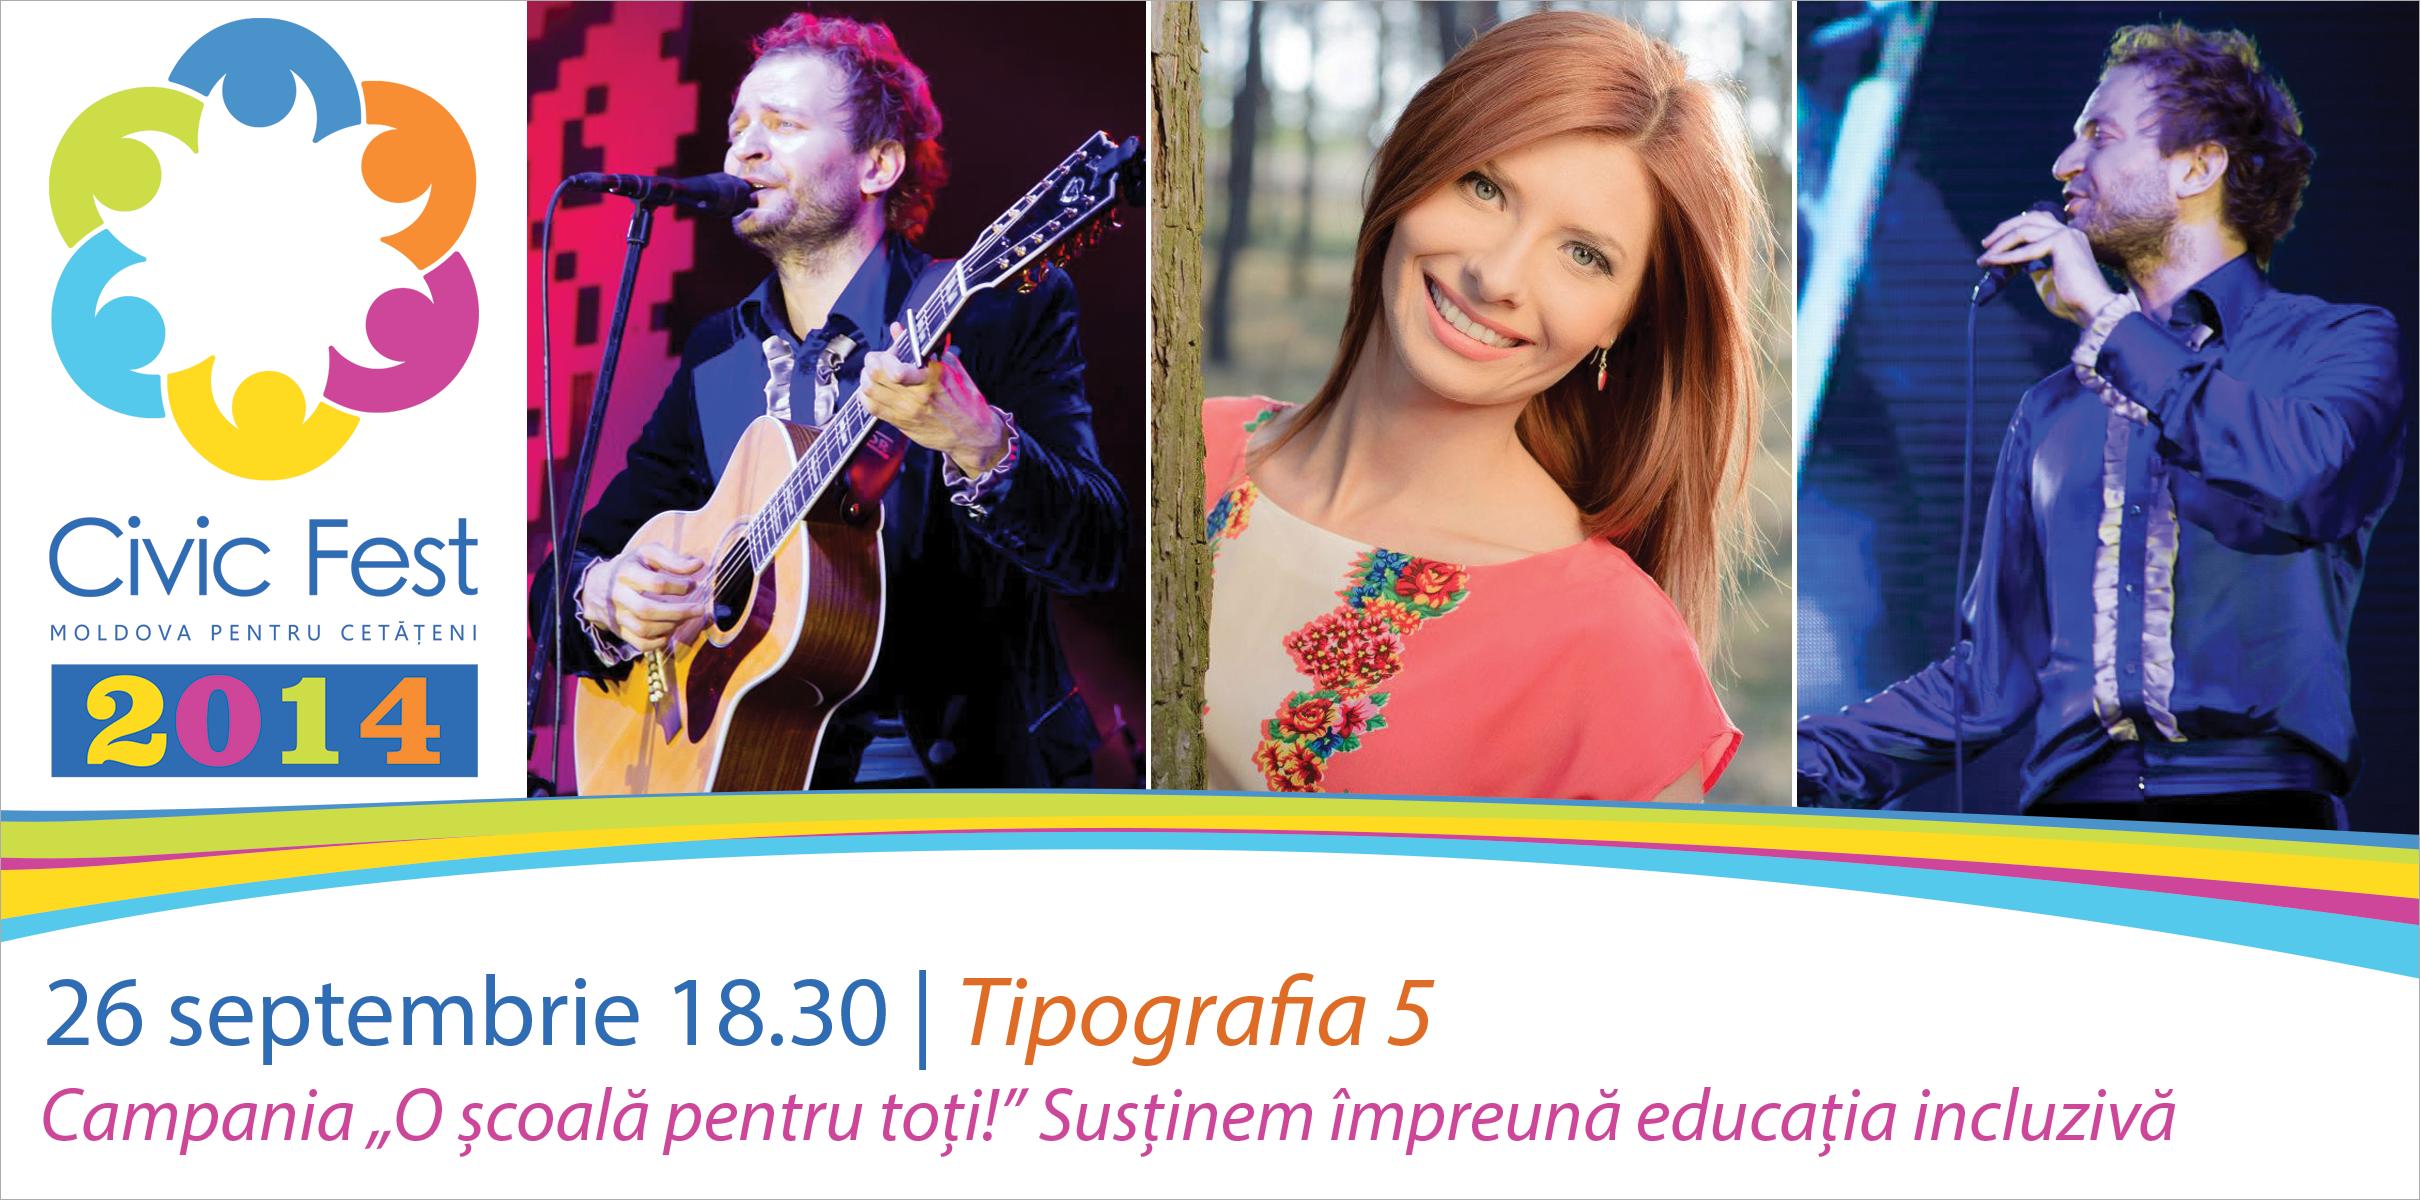 Sustinem impreuna educatia incluziva - concert Cristi Aldea Teodorovici